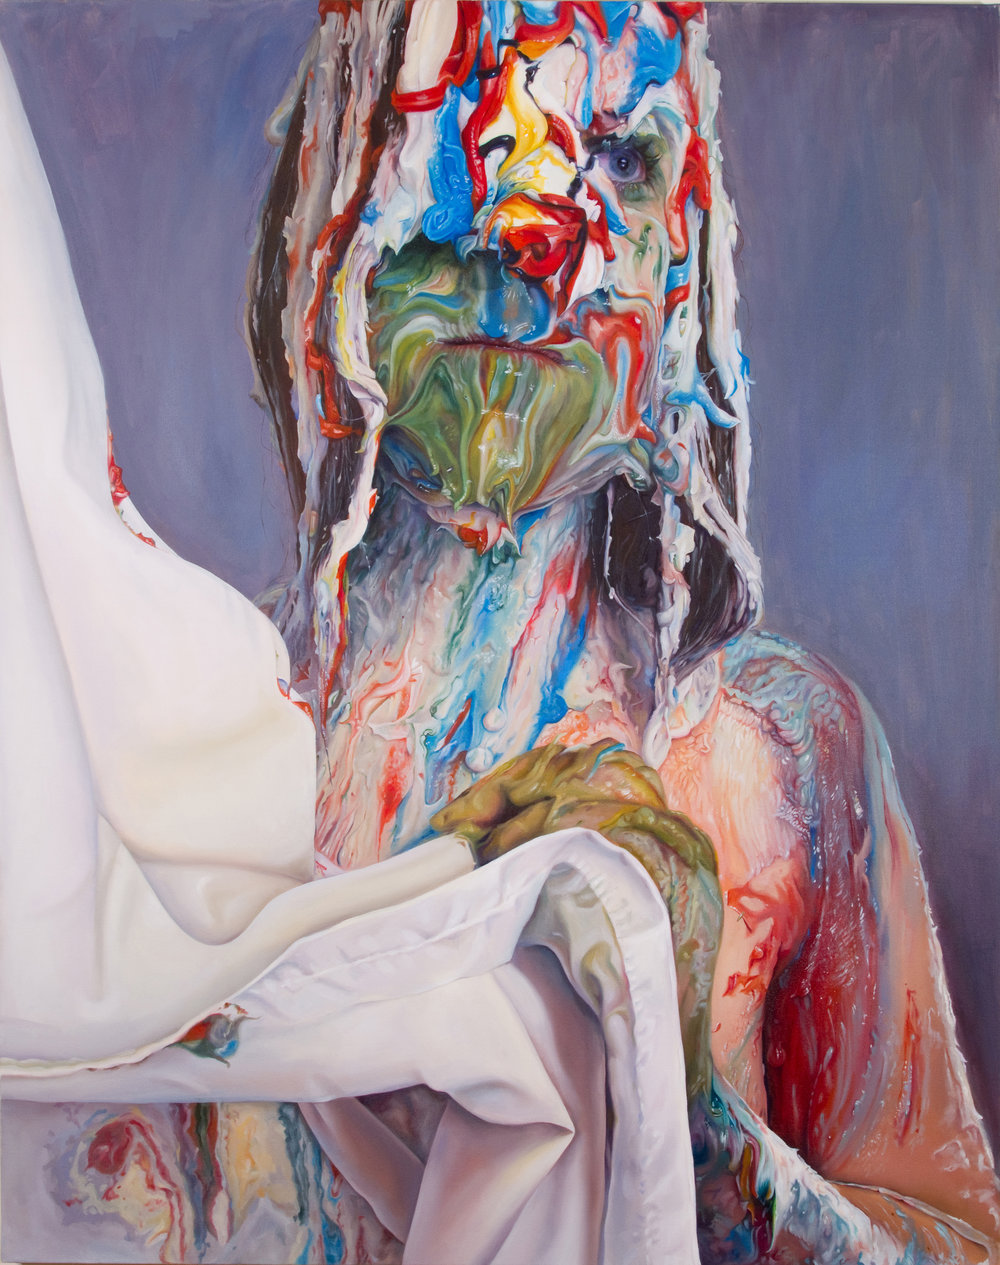 Marisa Adesman. Vertumnus' Bride . oil on canvas. 60 x 48 in.